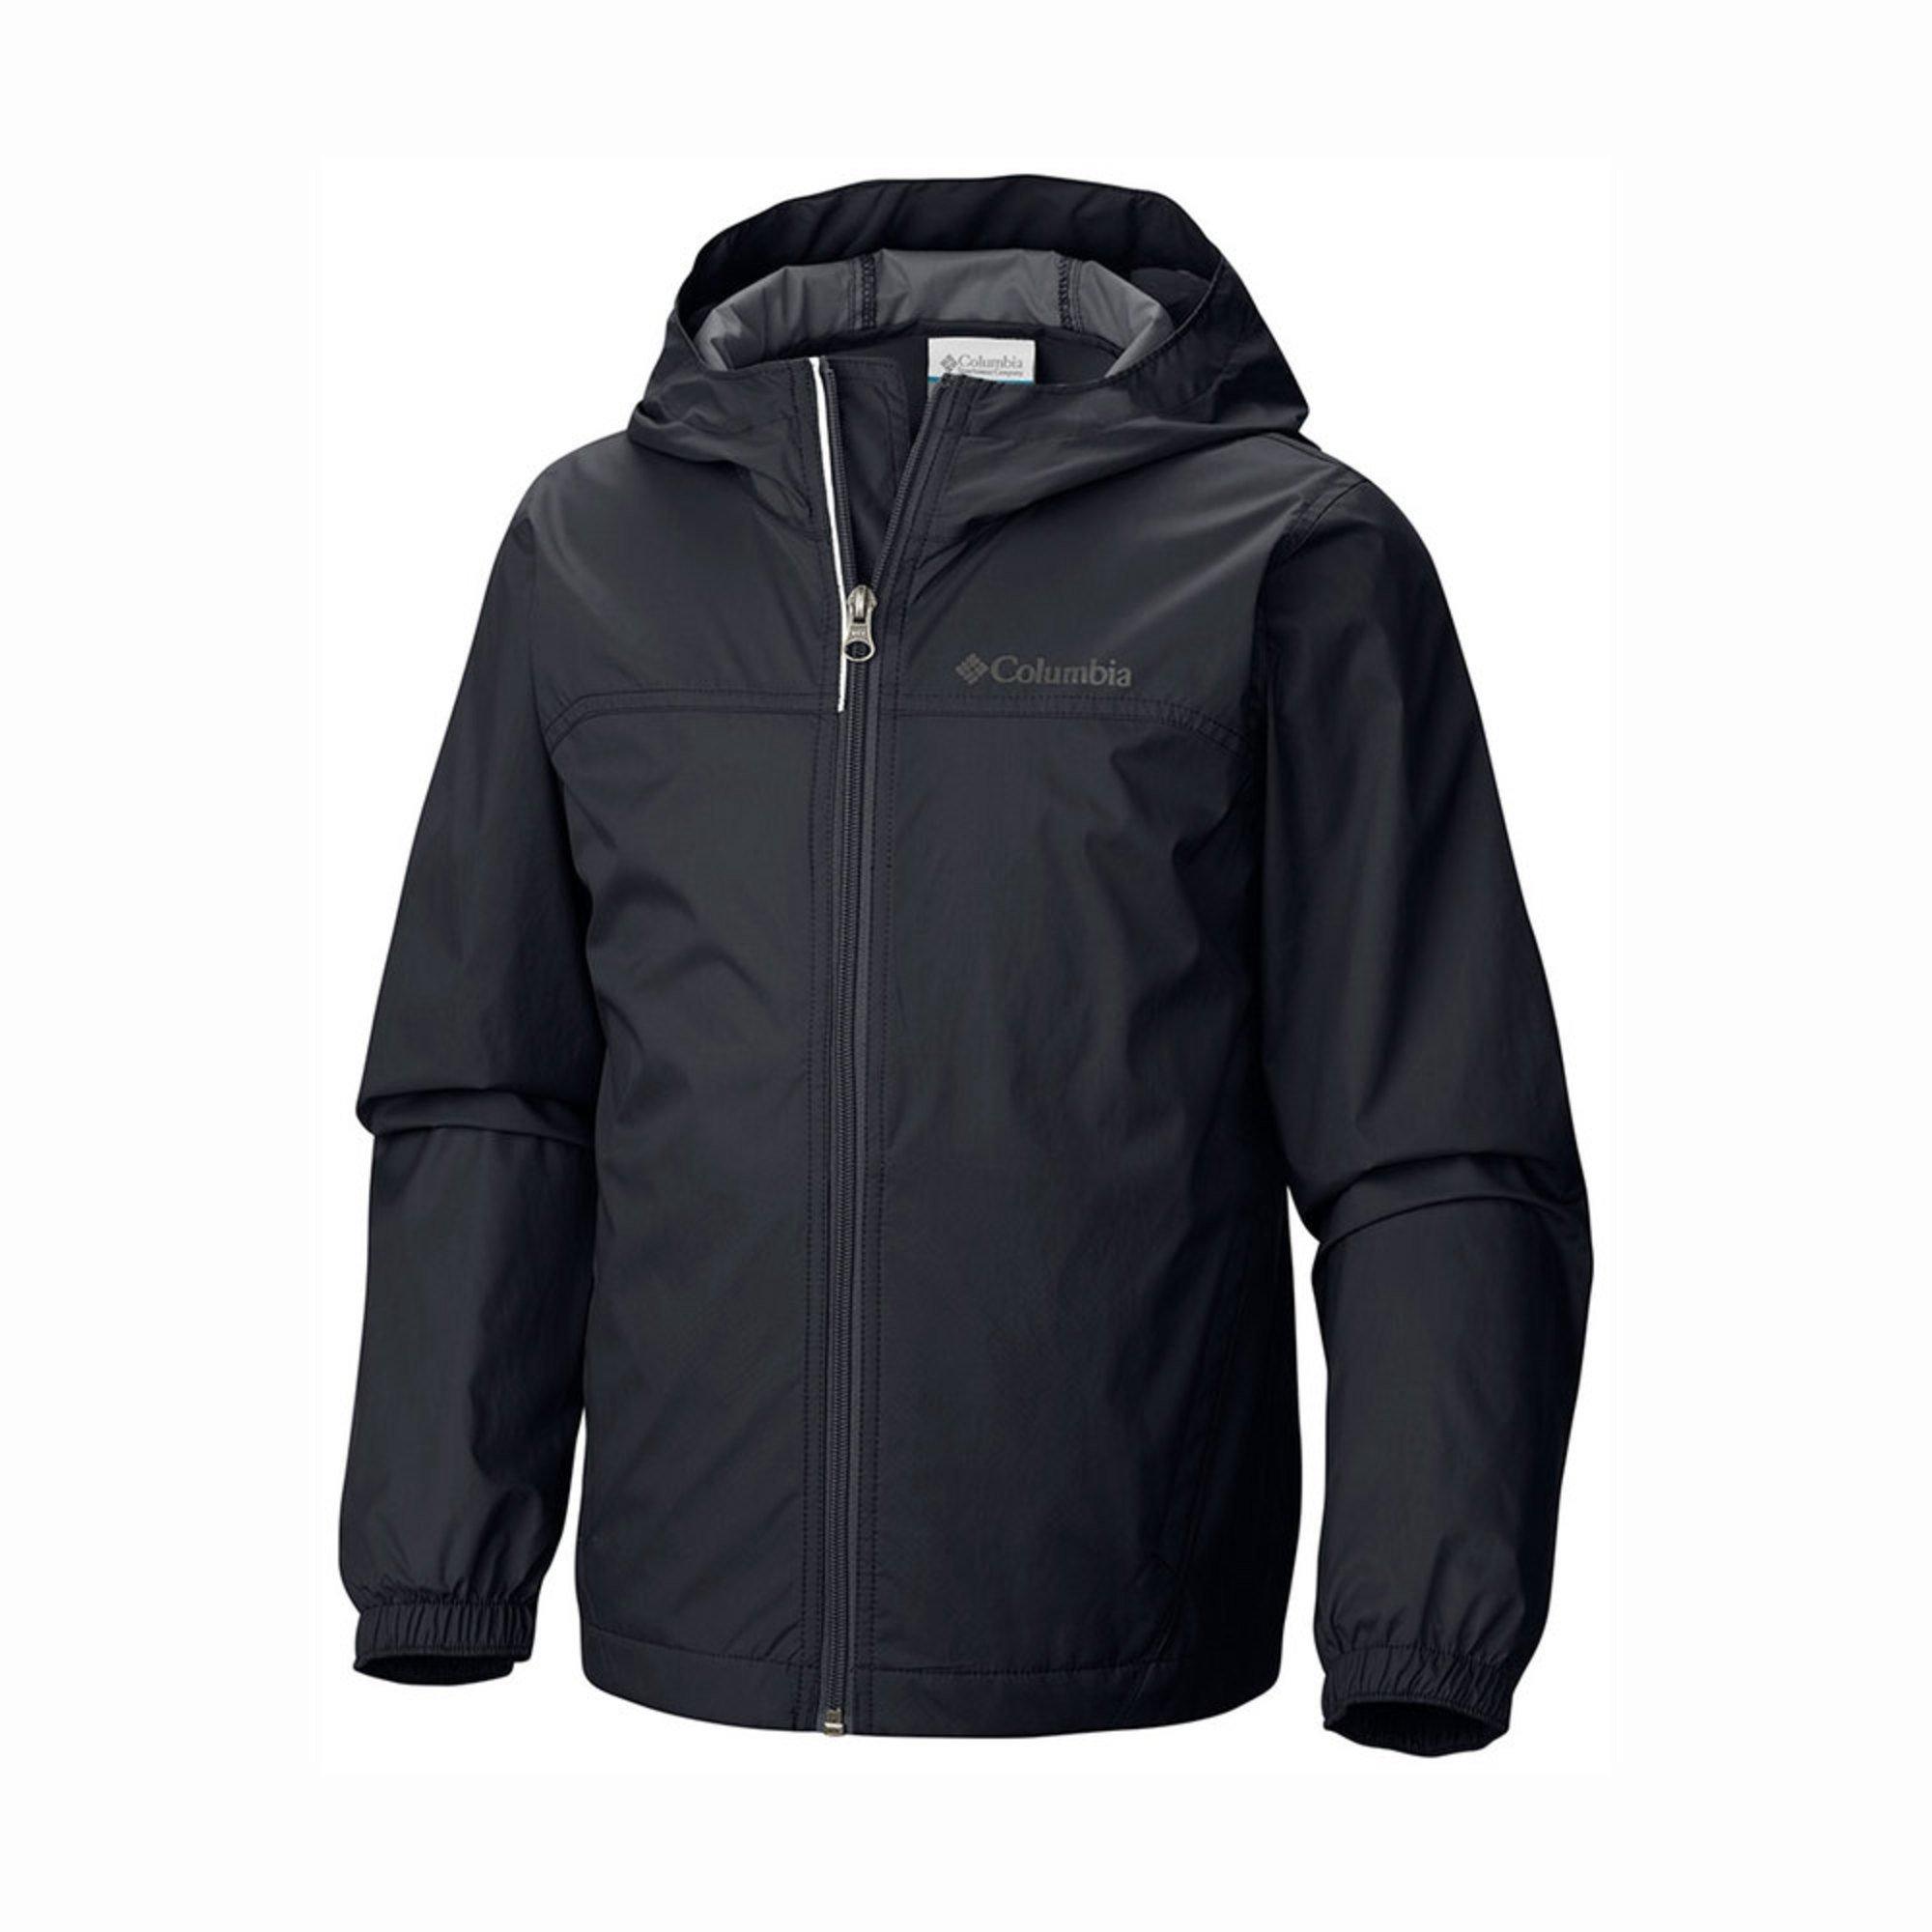 977e9549 Columbia Big Boys' Glennaker Rain Jacket, Black | Big Boys' Coats ...